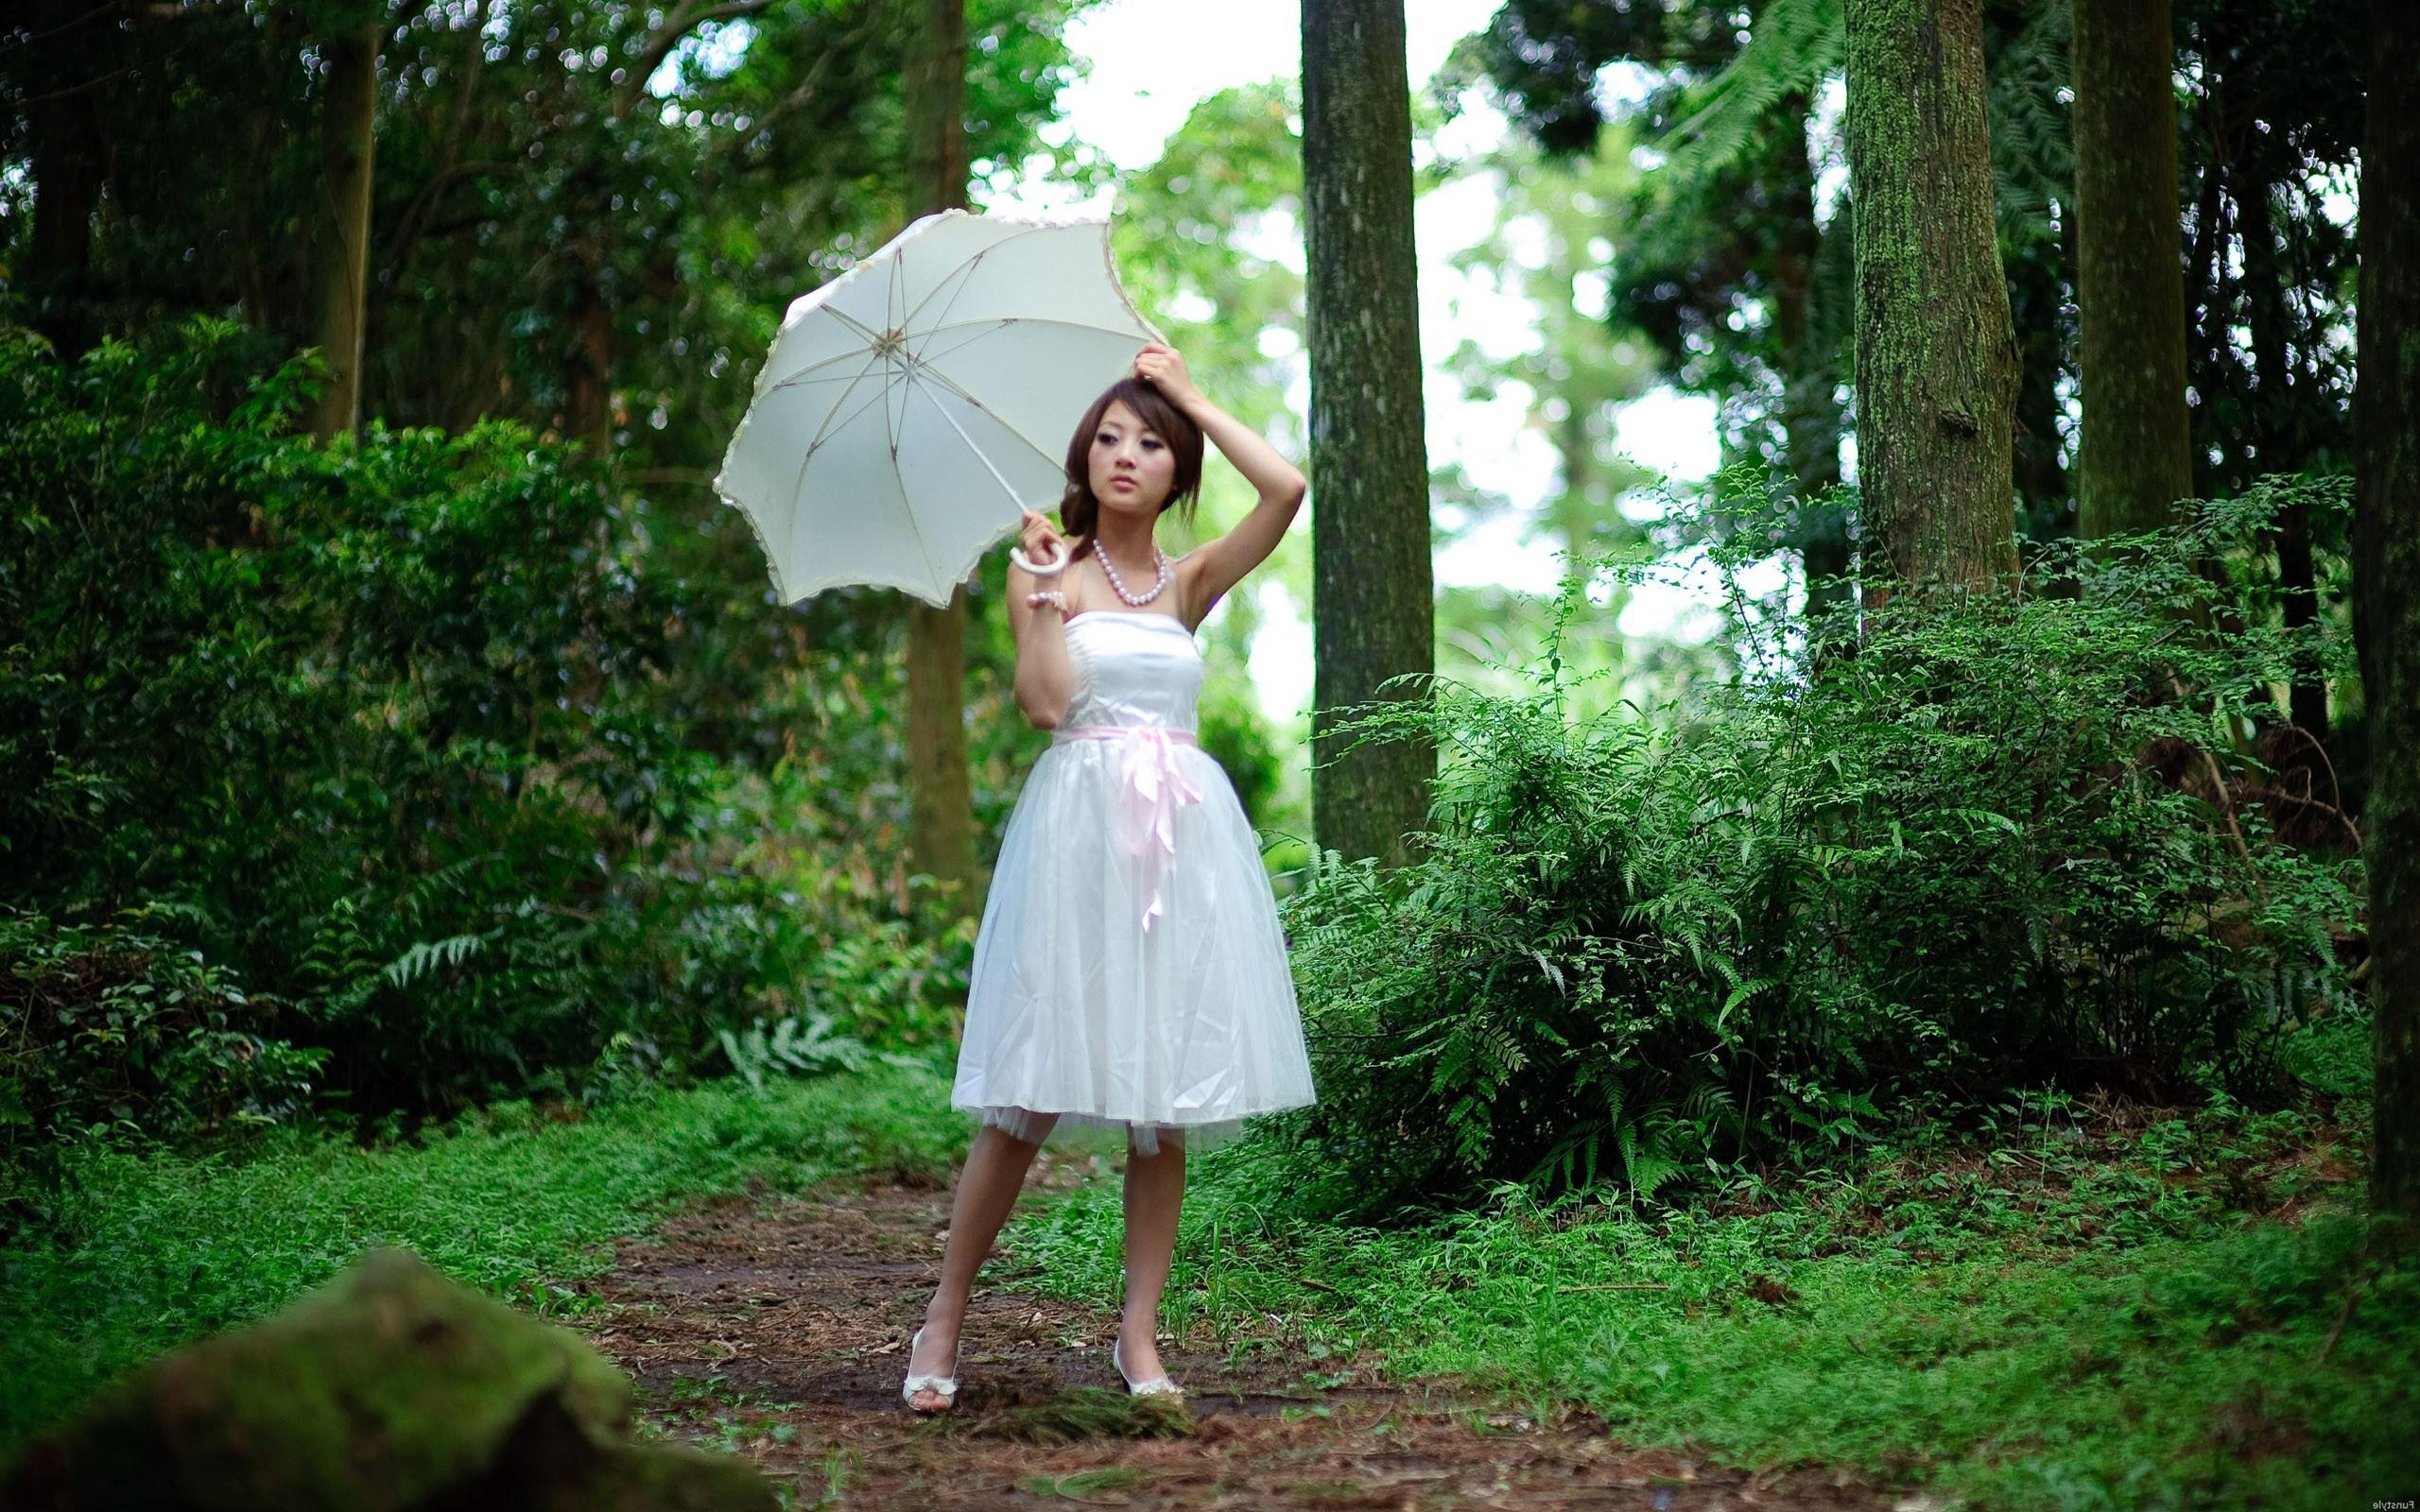 Asian, Women, Women Outdoors, White Dress, Umbrella Wallpapers HD / Desktop  and Mobile Backgrounds